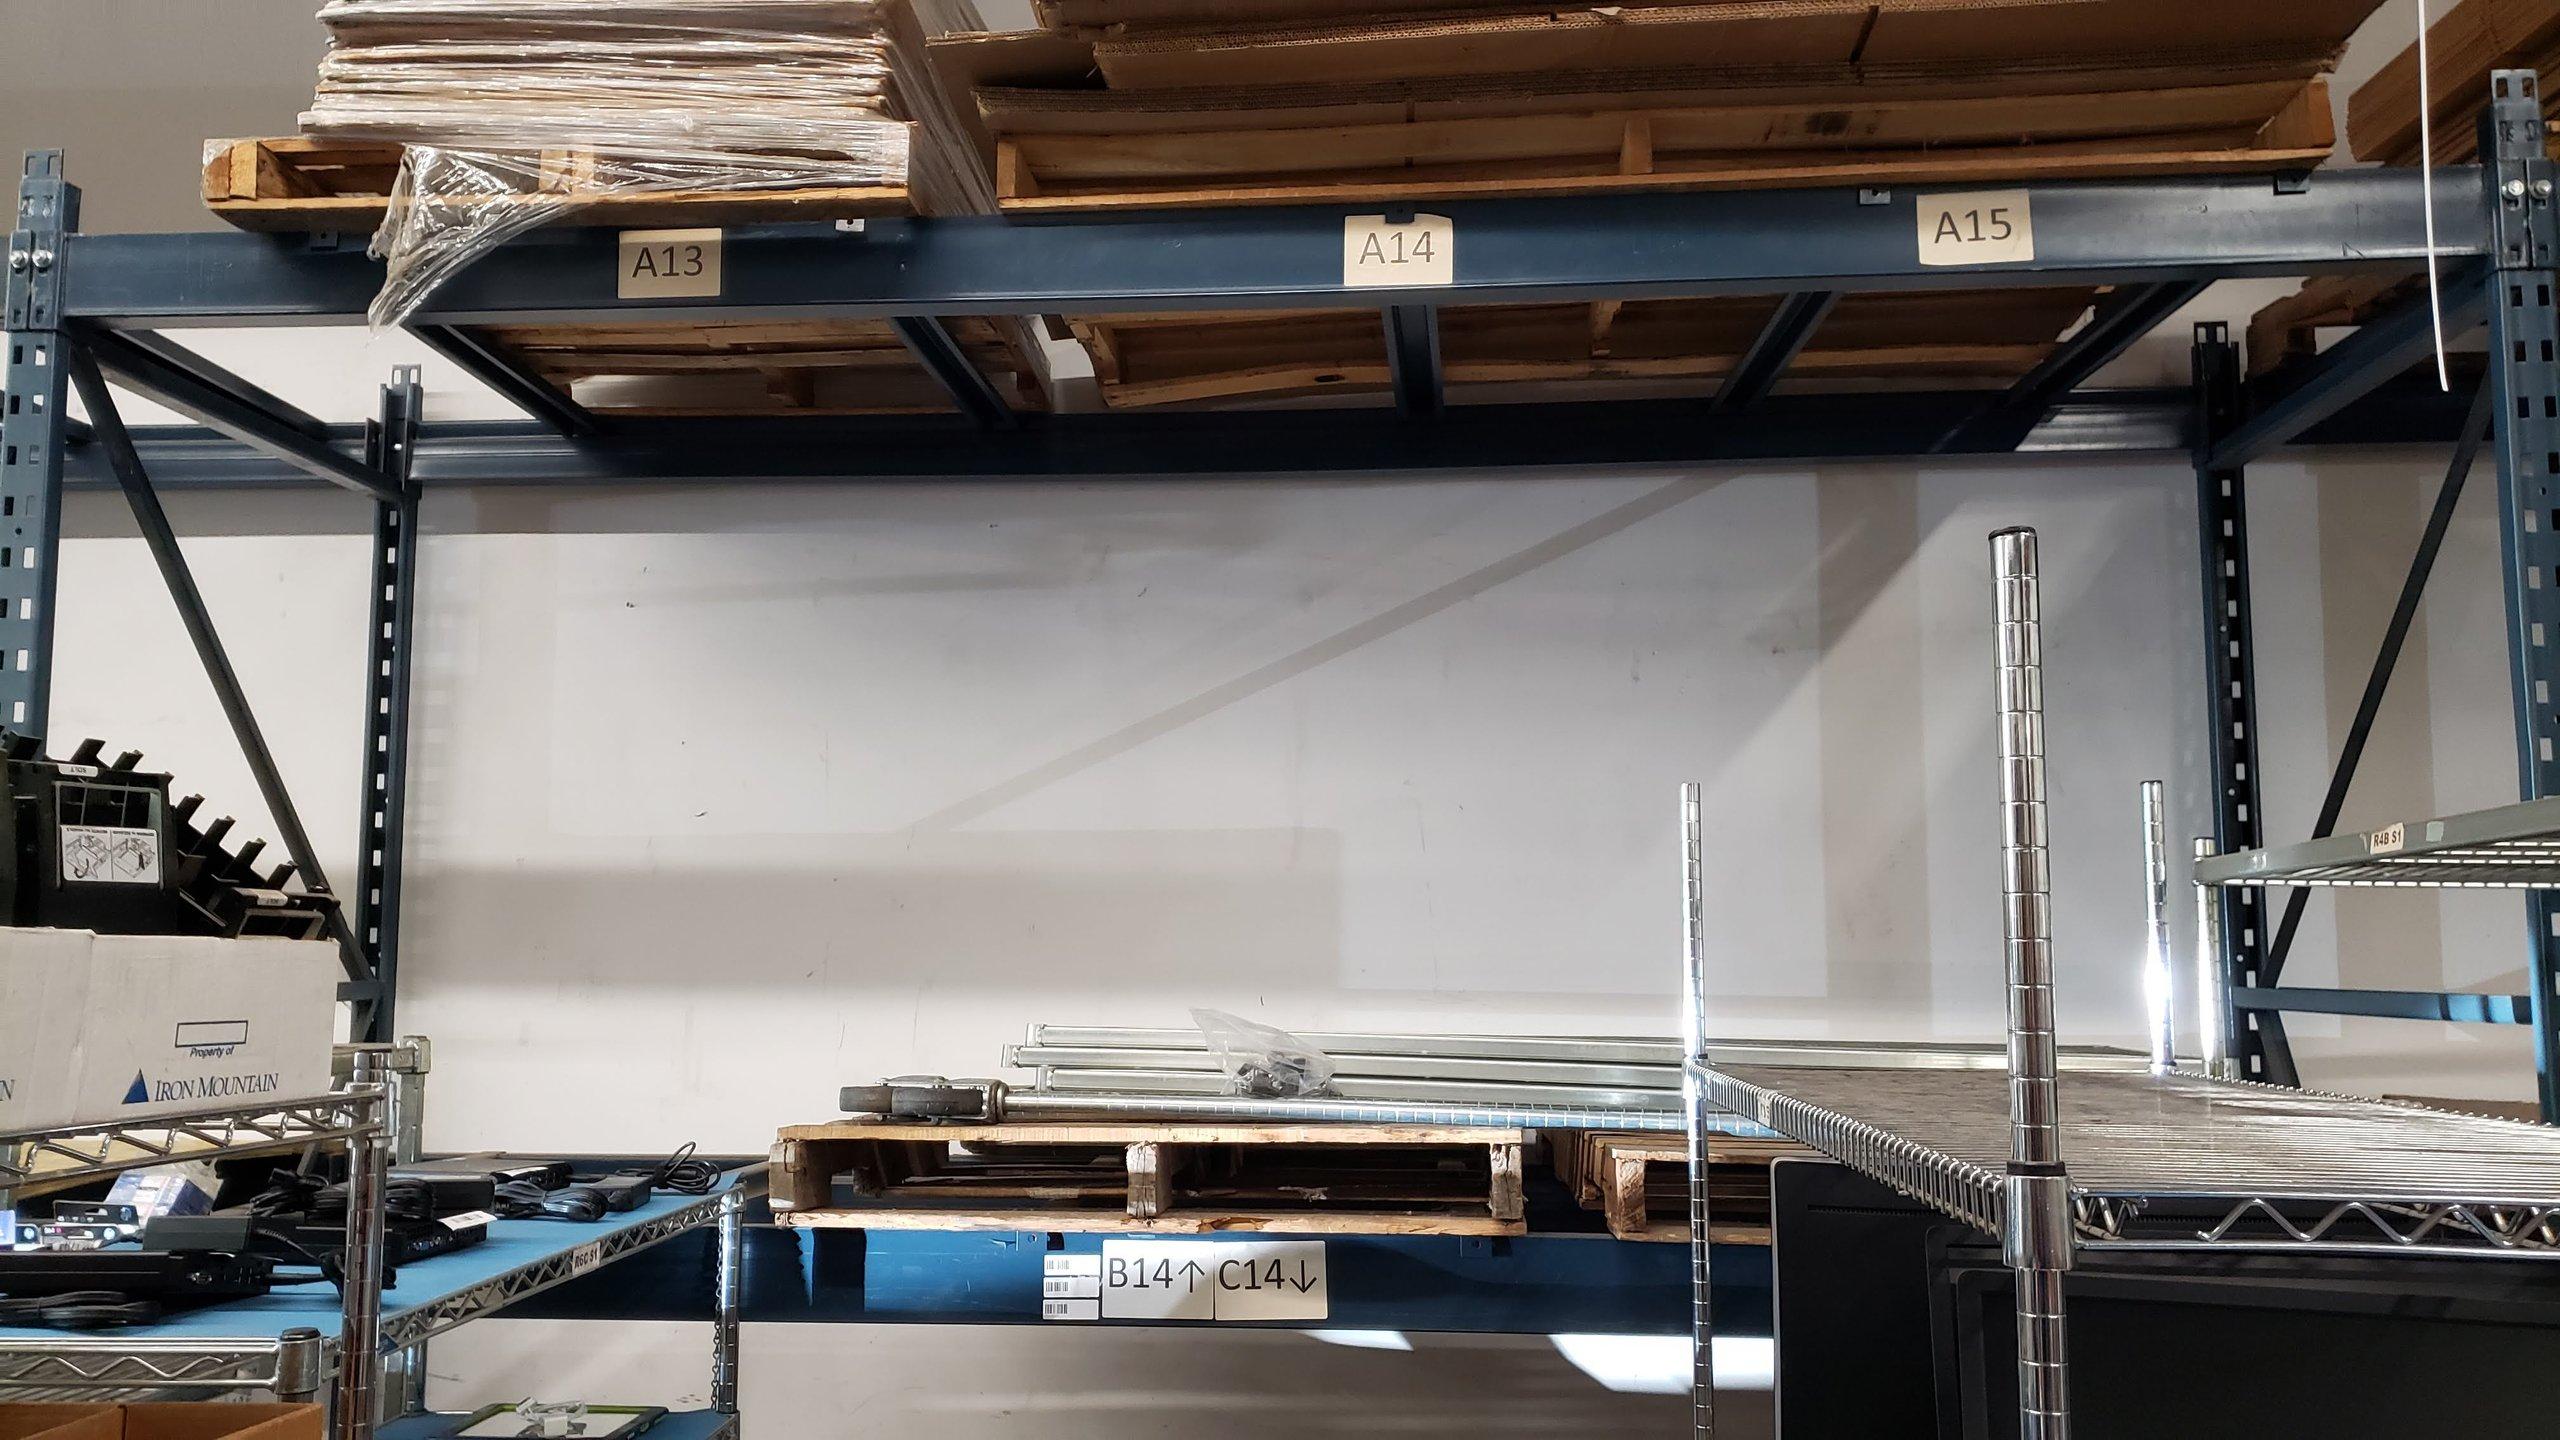 4x4 Warehouse self storage unit